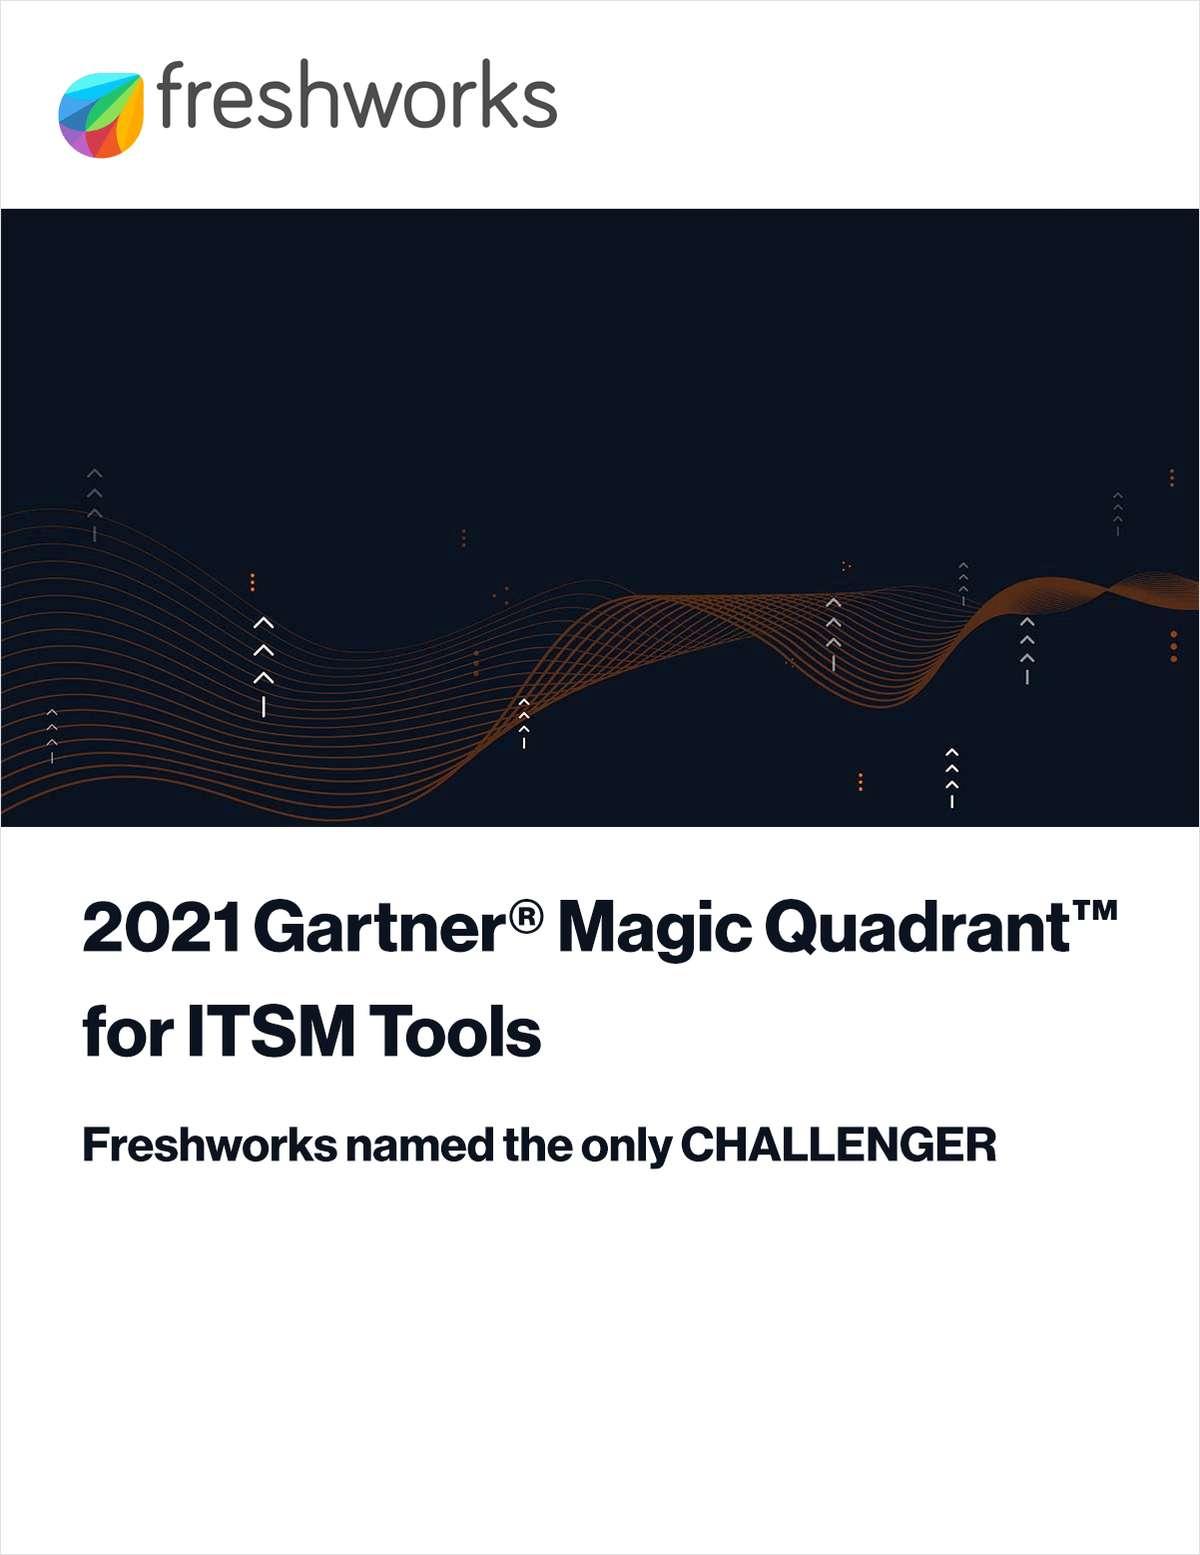 2021 Gartner® Magic Quadrant™ for ITSM Tools